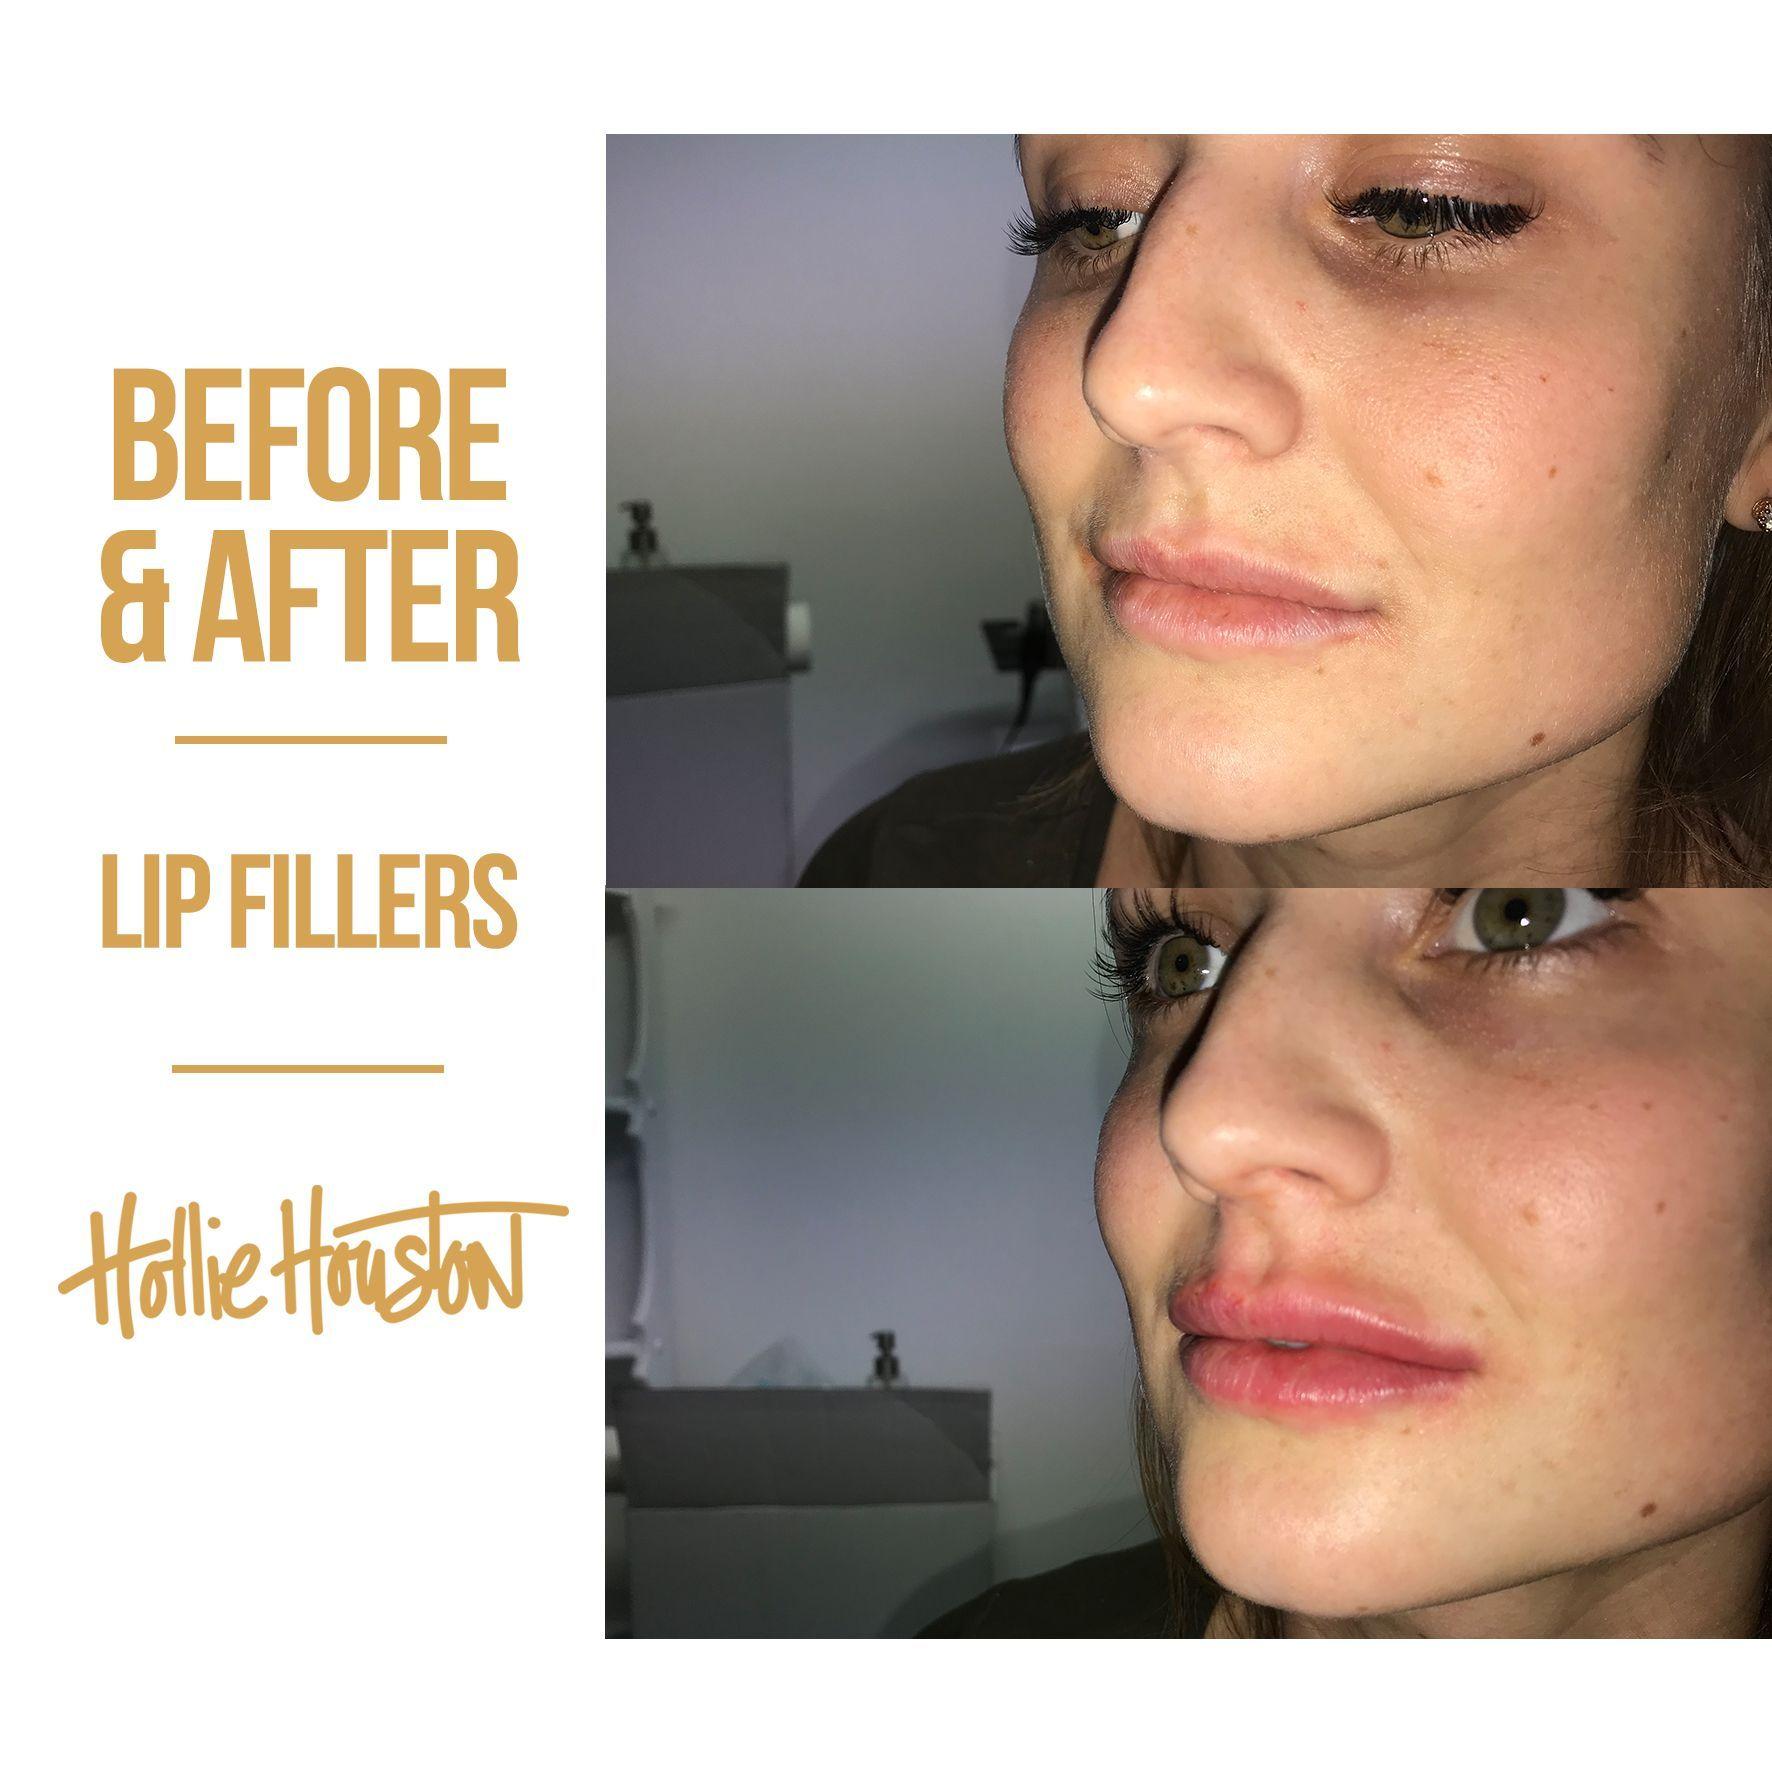 be1459458d0f5cad317546eb4ec7da0c - How To Get Swelling To Go Down On Lip